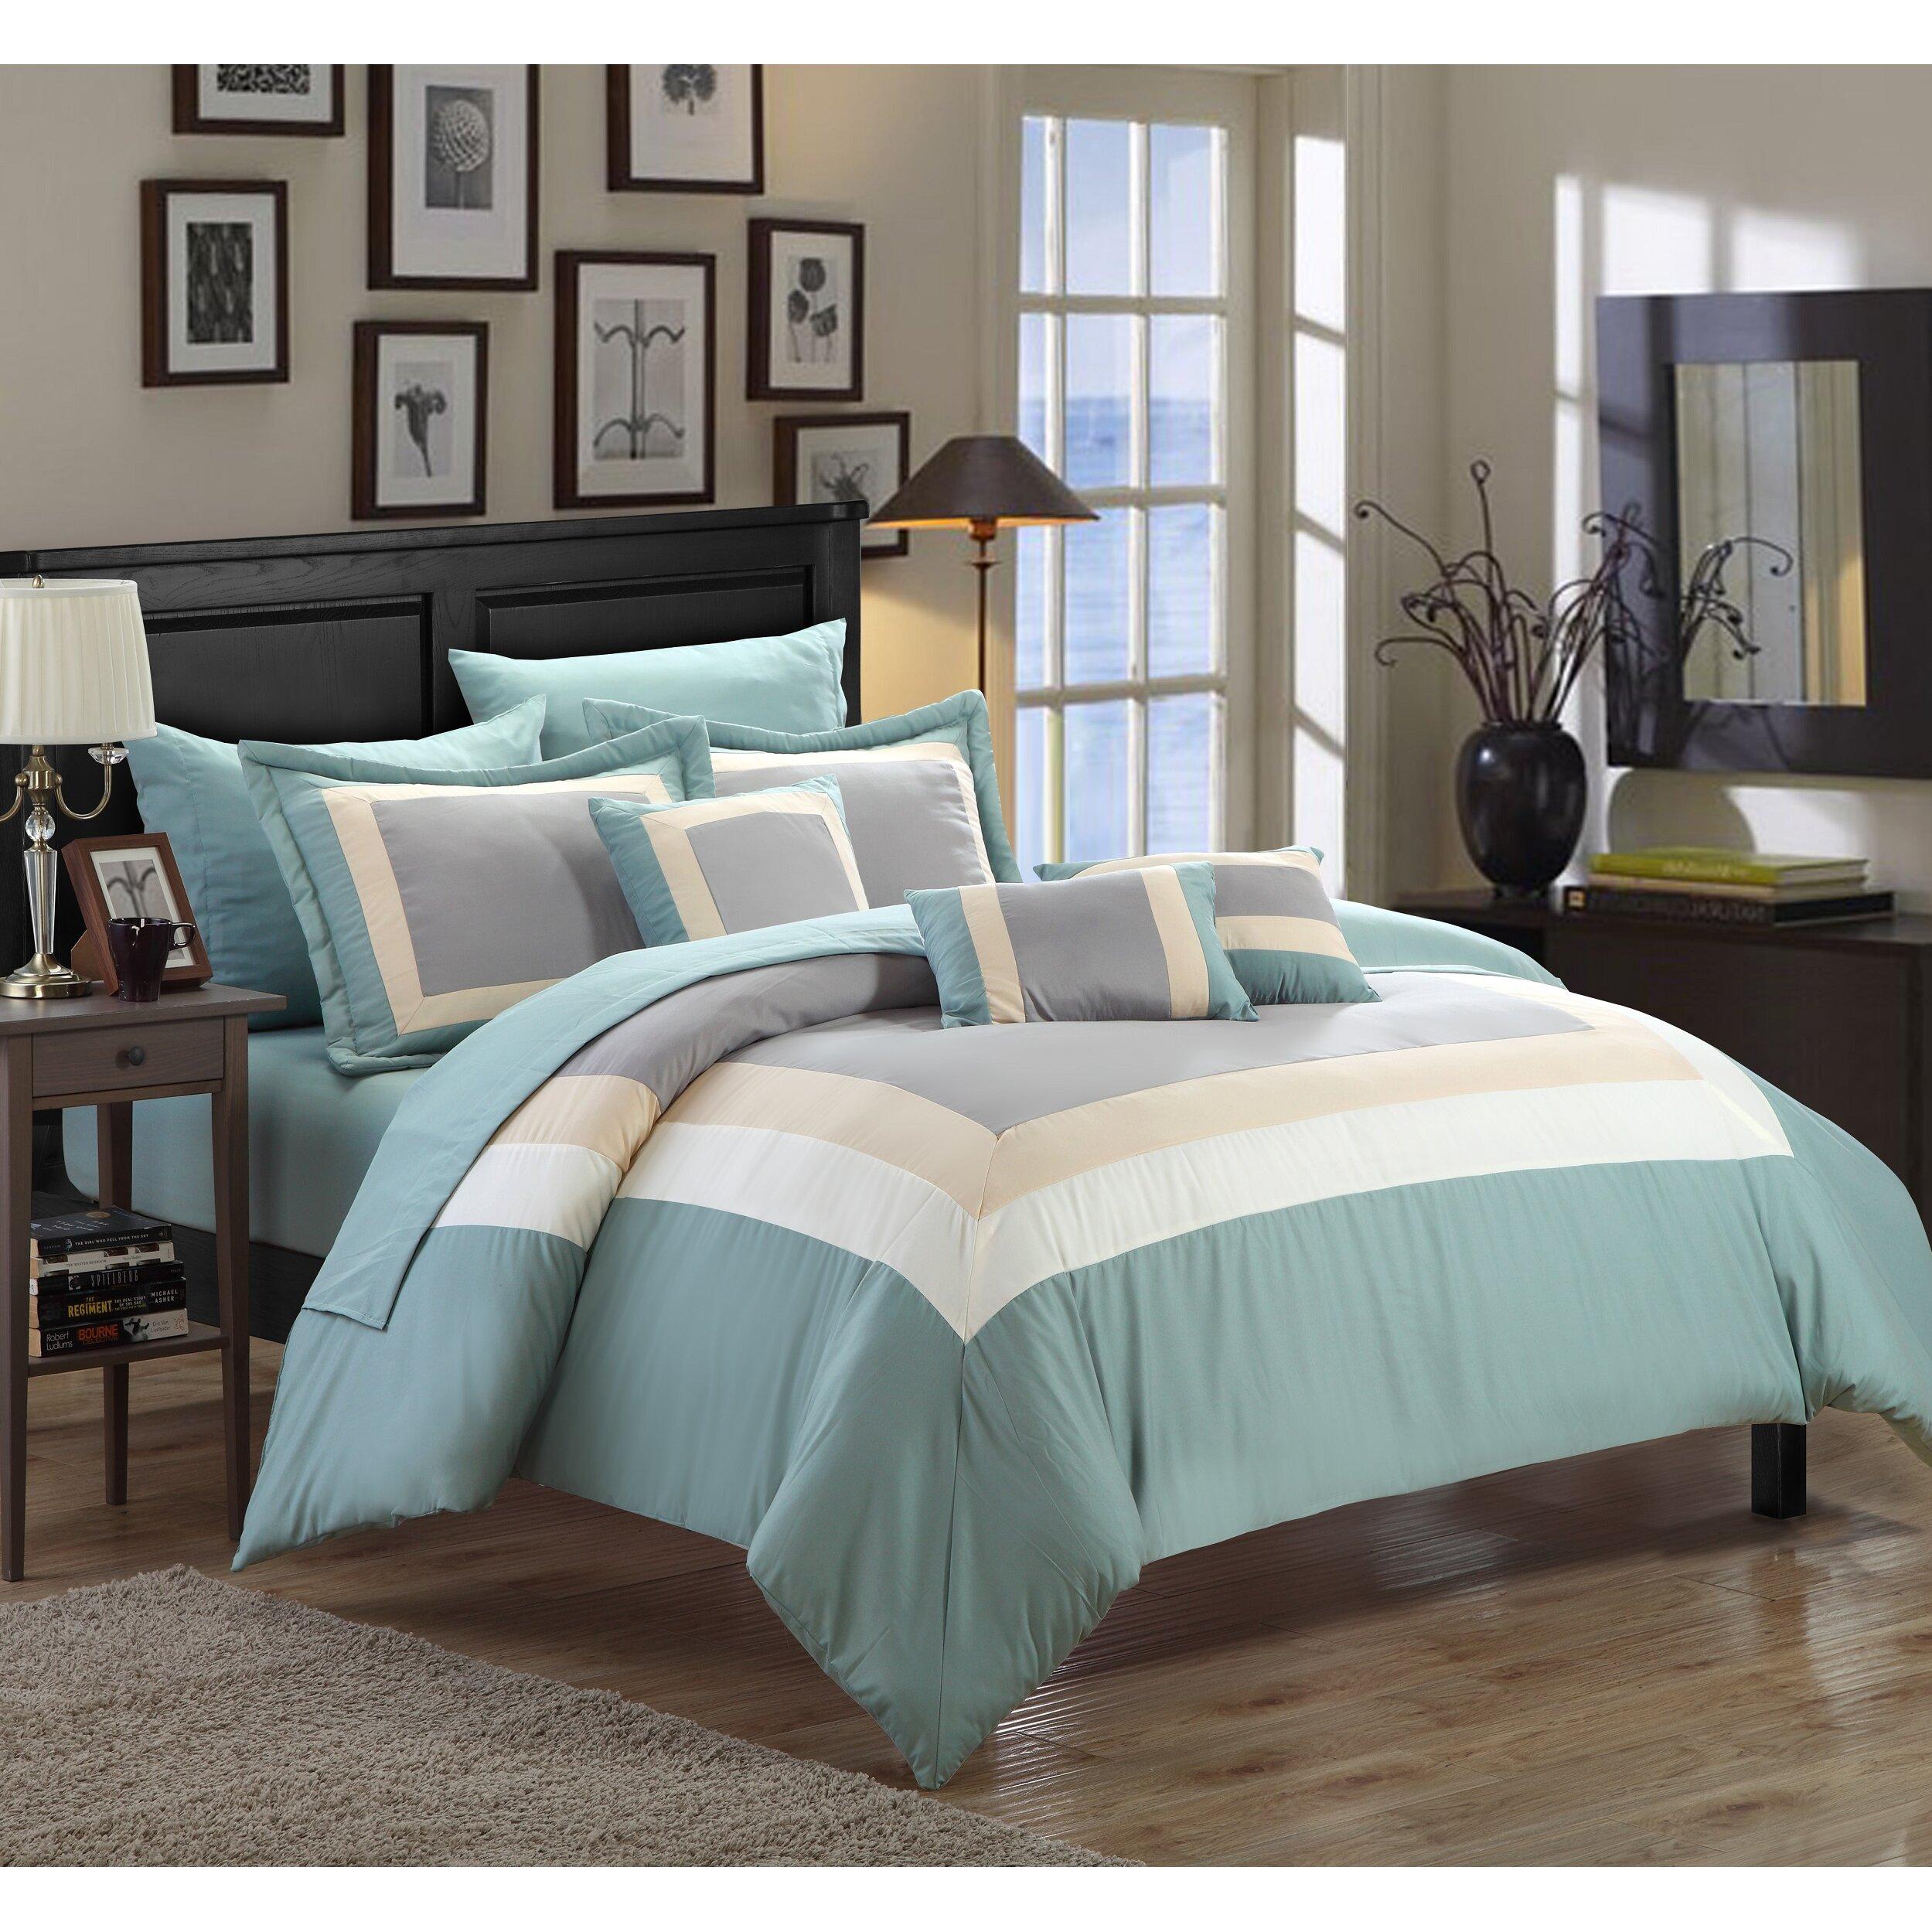 chic home duke 10 piece bed-in-a-bag set & reviews | wayfair